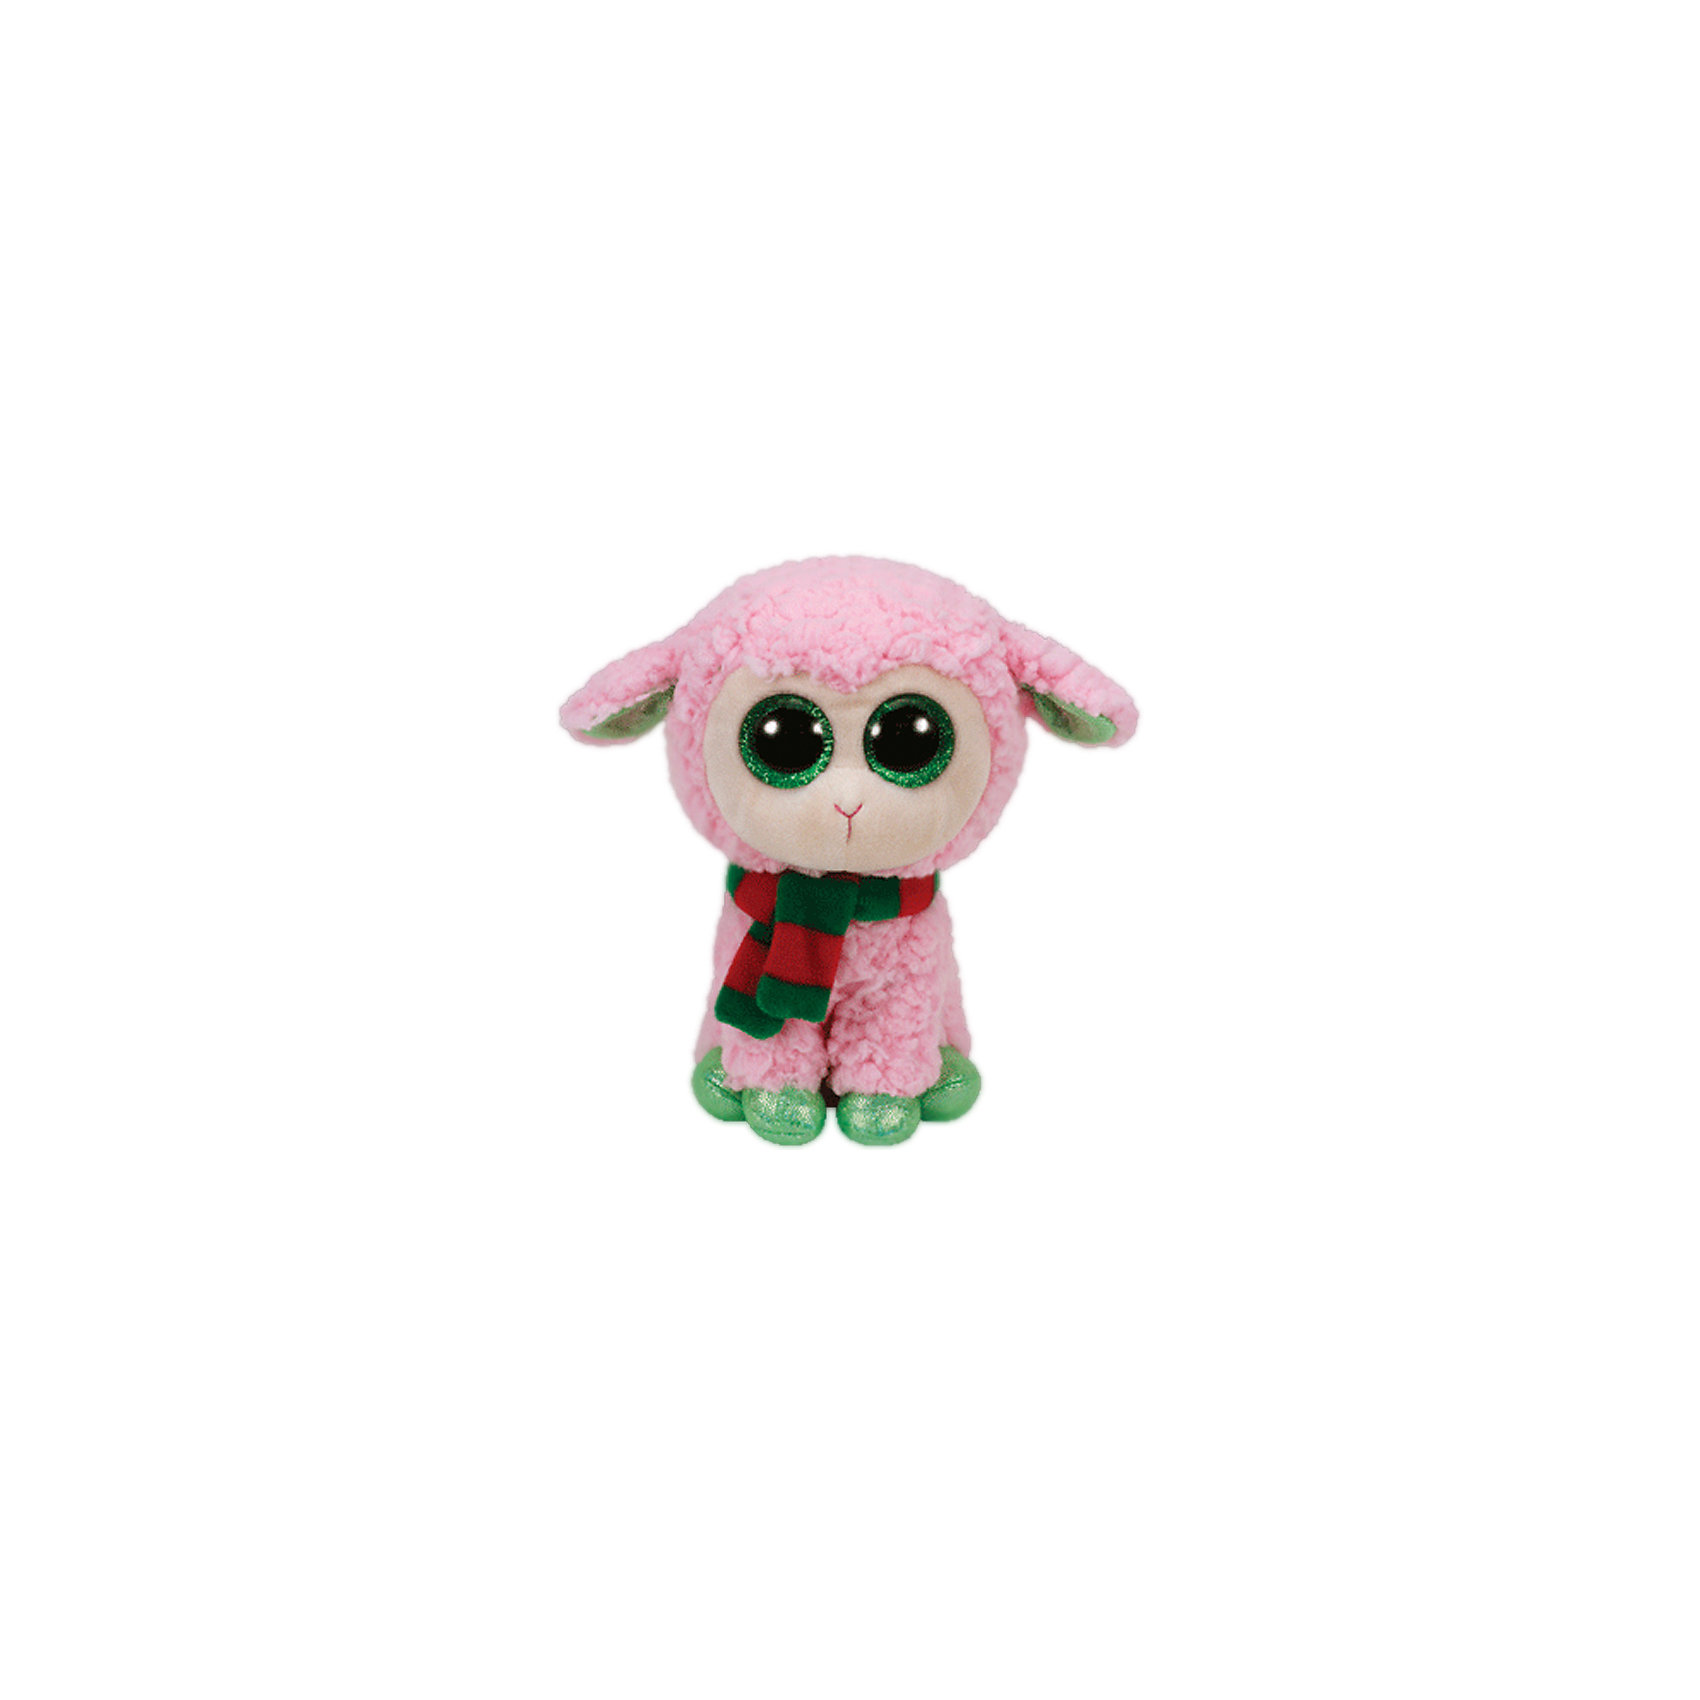 Овечка розовая с шарфом, 23 см, Ty